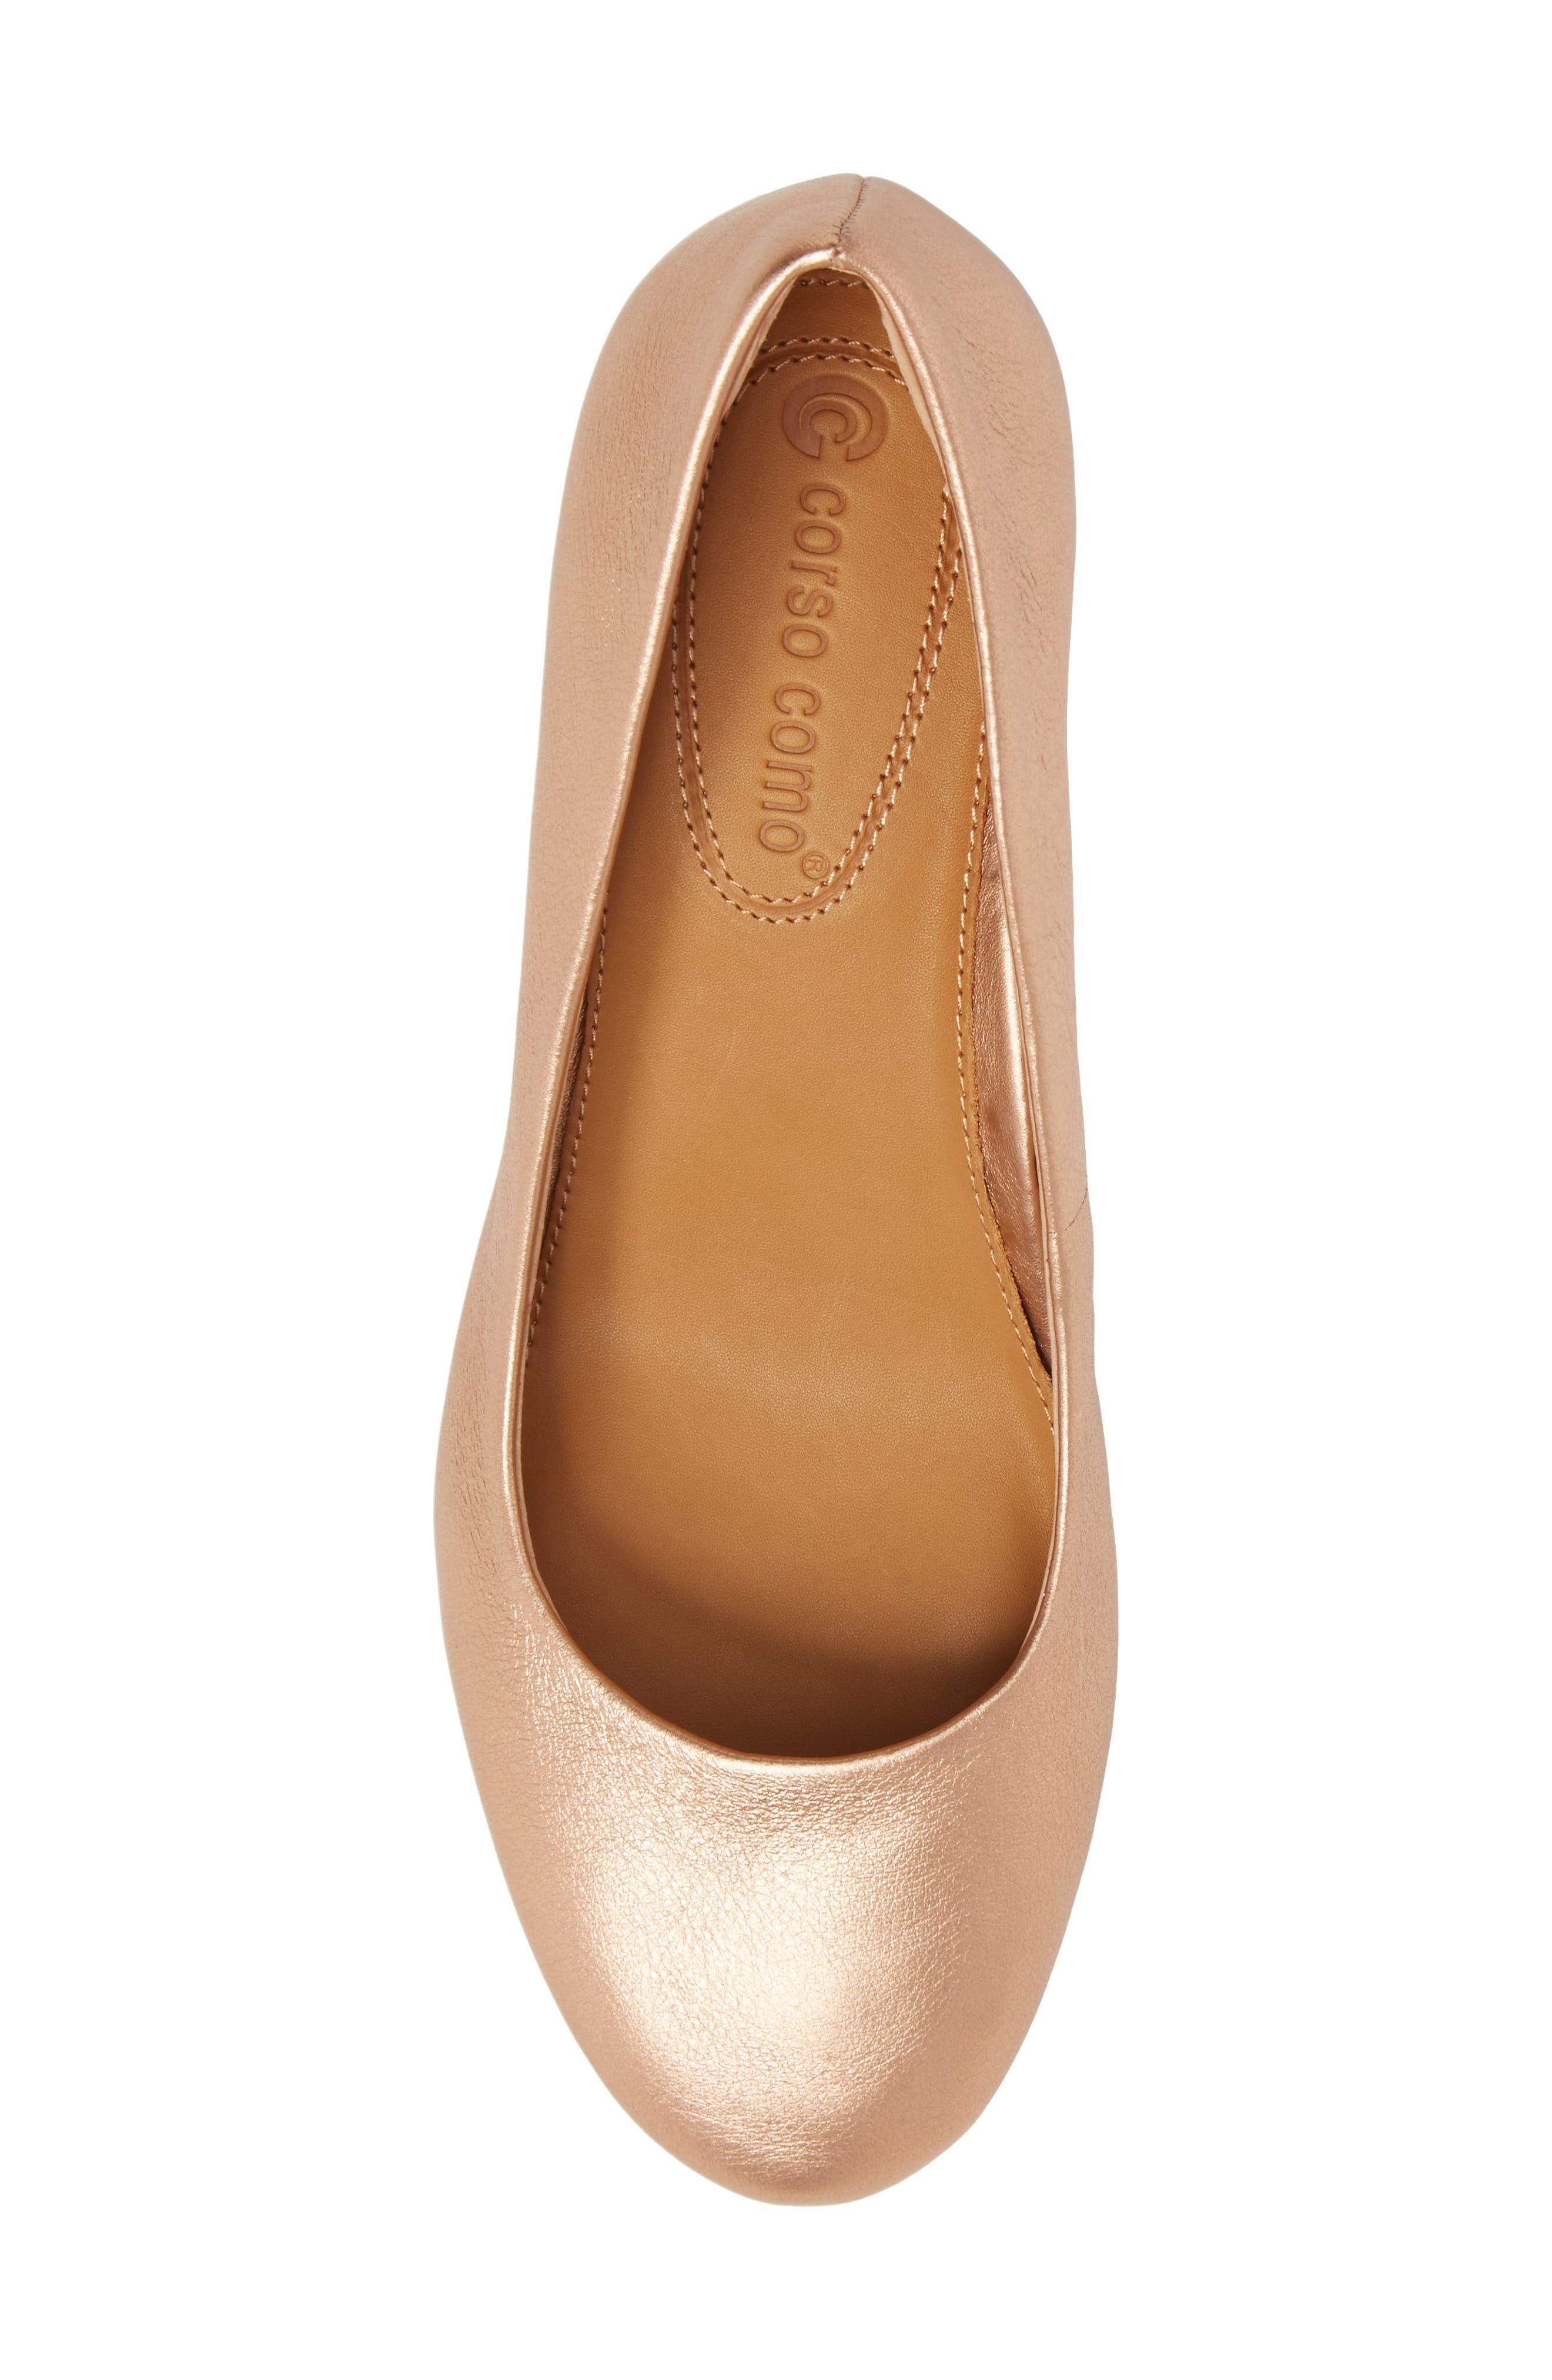 Gwynn Block Heel Pump,                             Alternate thumbnail 5, color,                             Rose Gold Leather